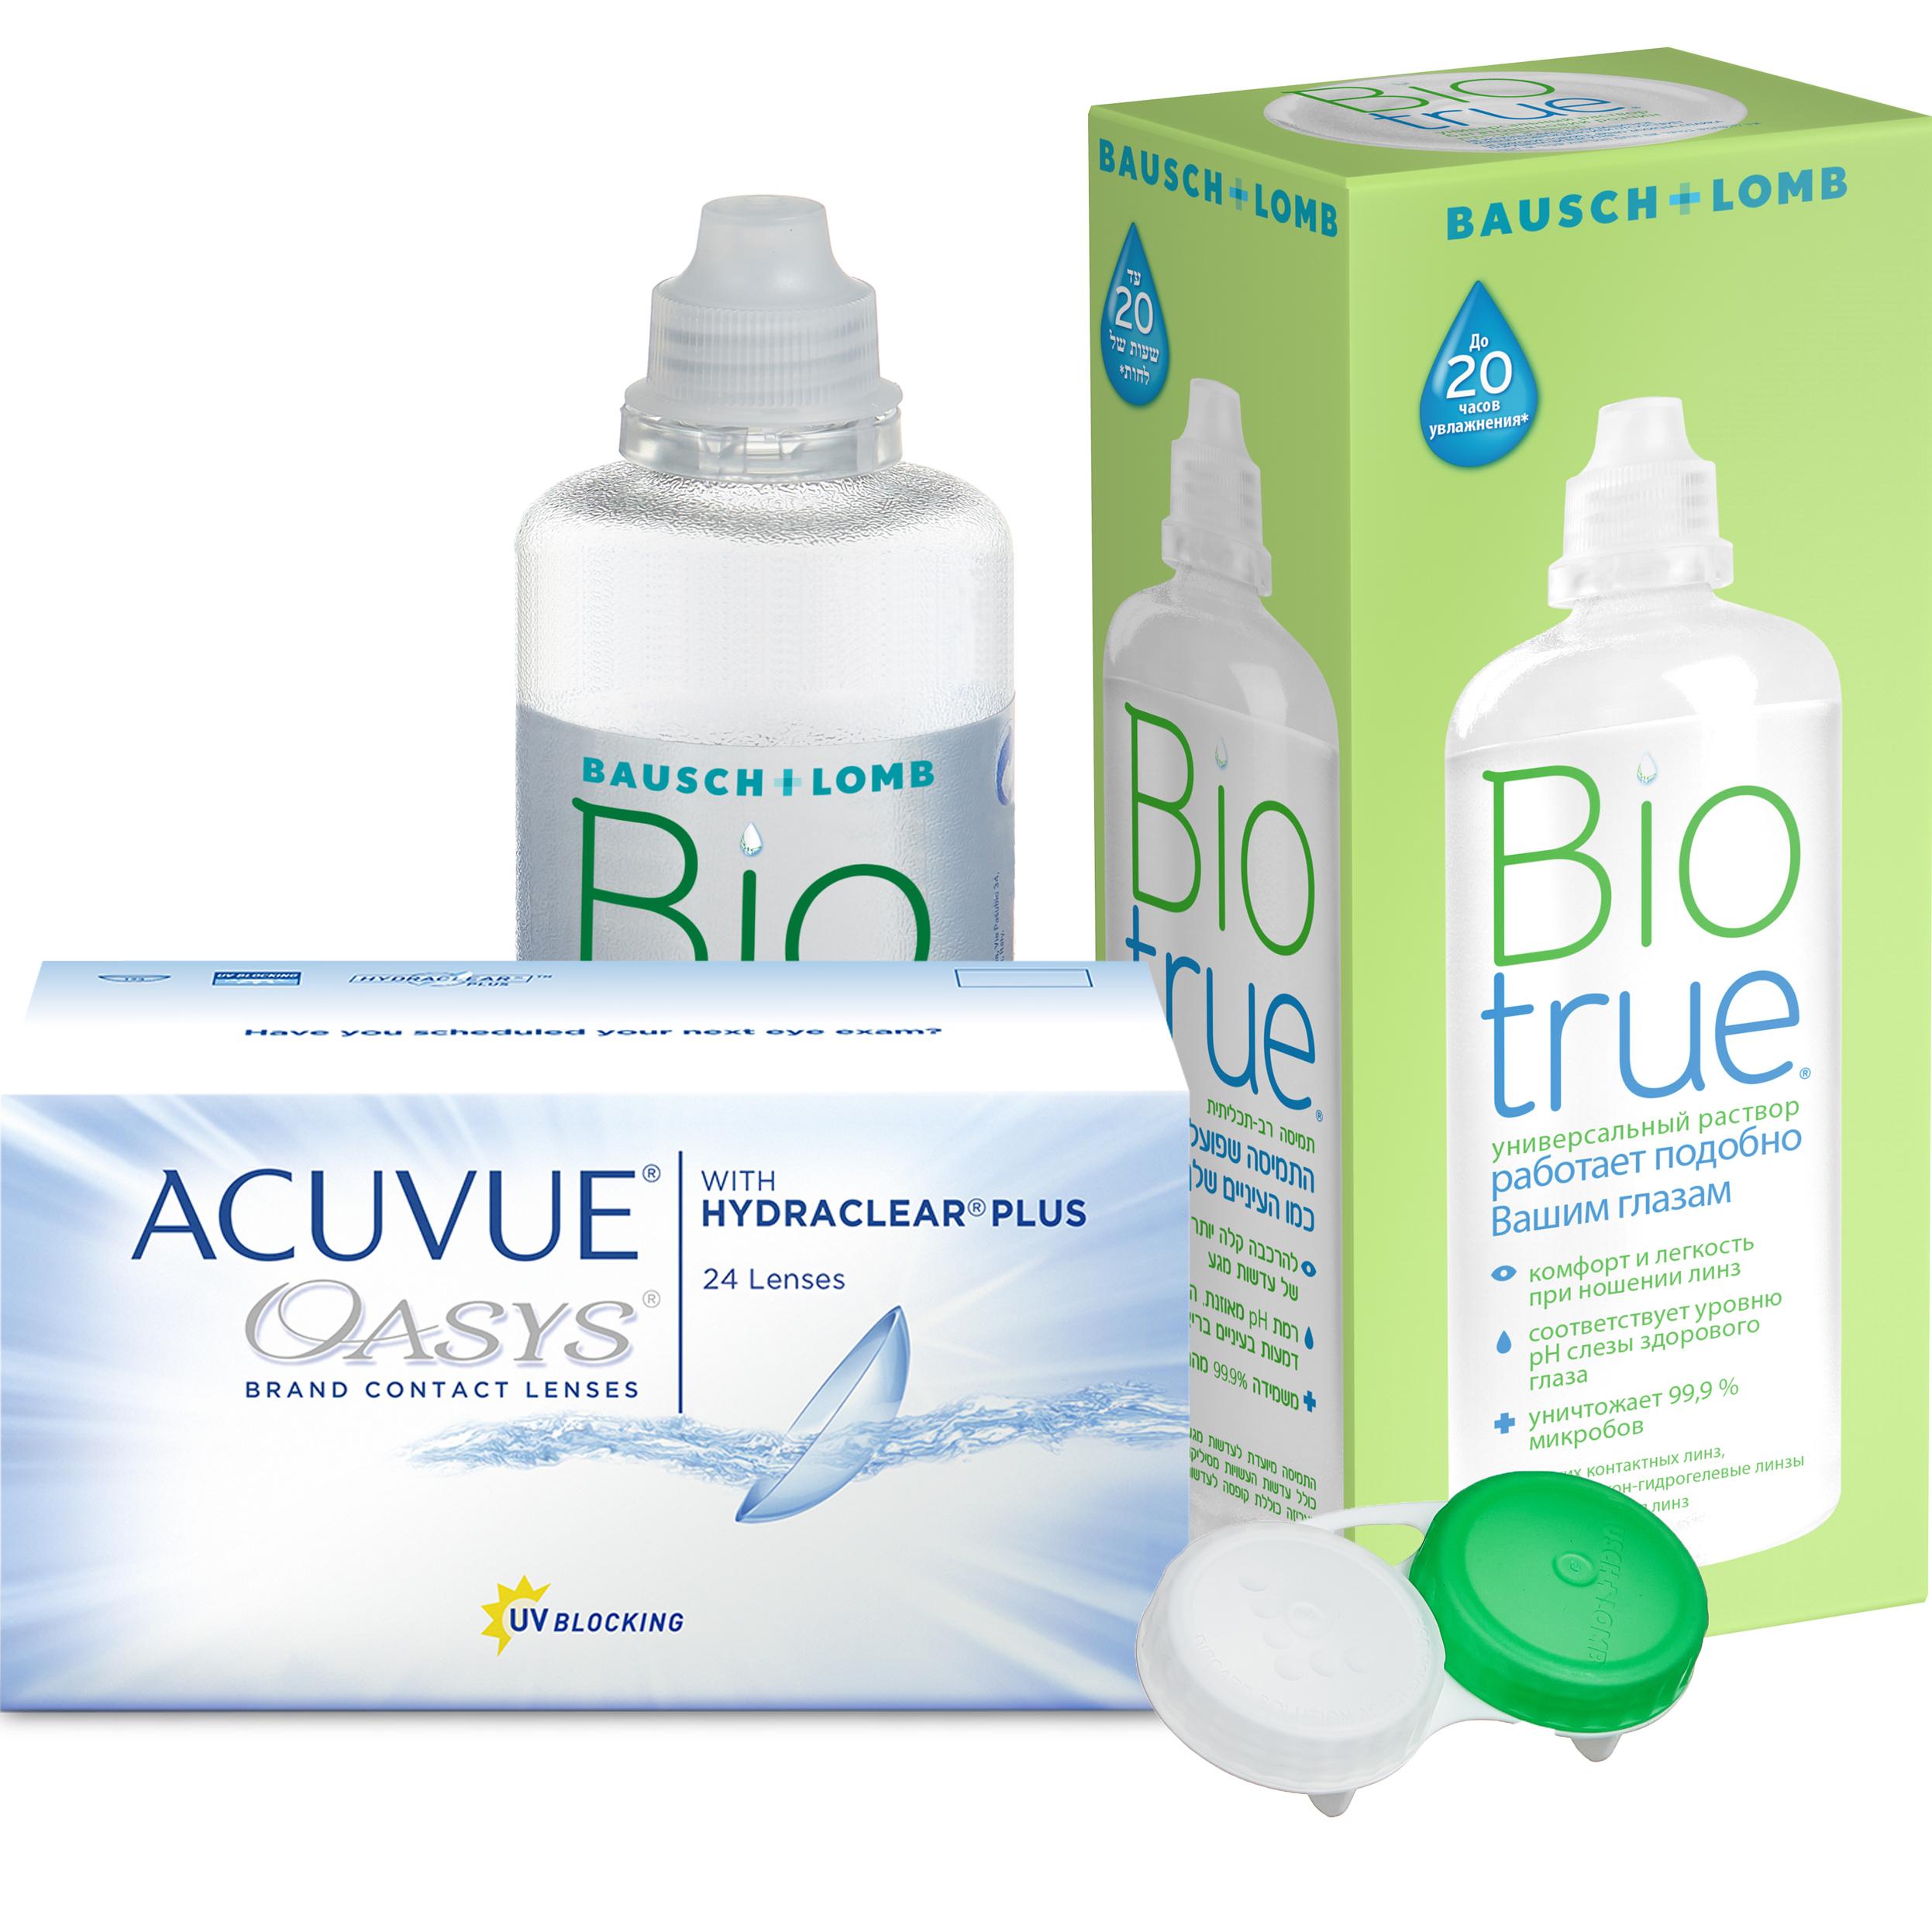 Купить Oasys with Hydraclear Plus 24 линзы + Biotrue, Контактные линзы Acuvue Oasys with Hydraclear Plus 24 линзы R 8.4 +3, 25 + Biotrue 300 мл